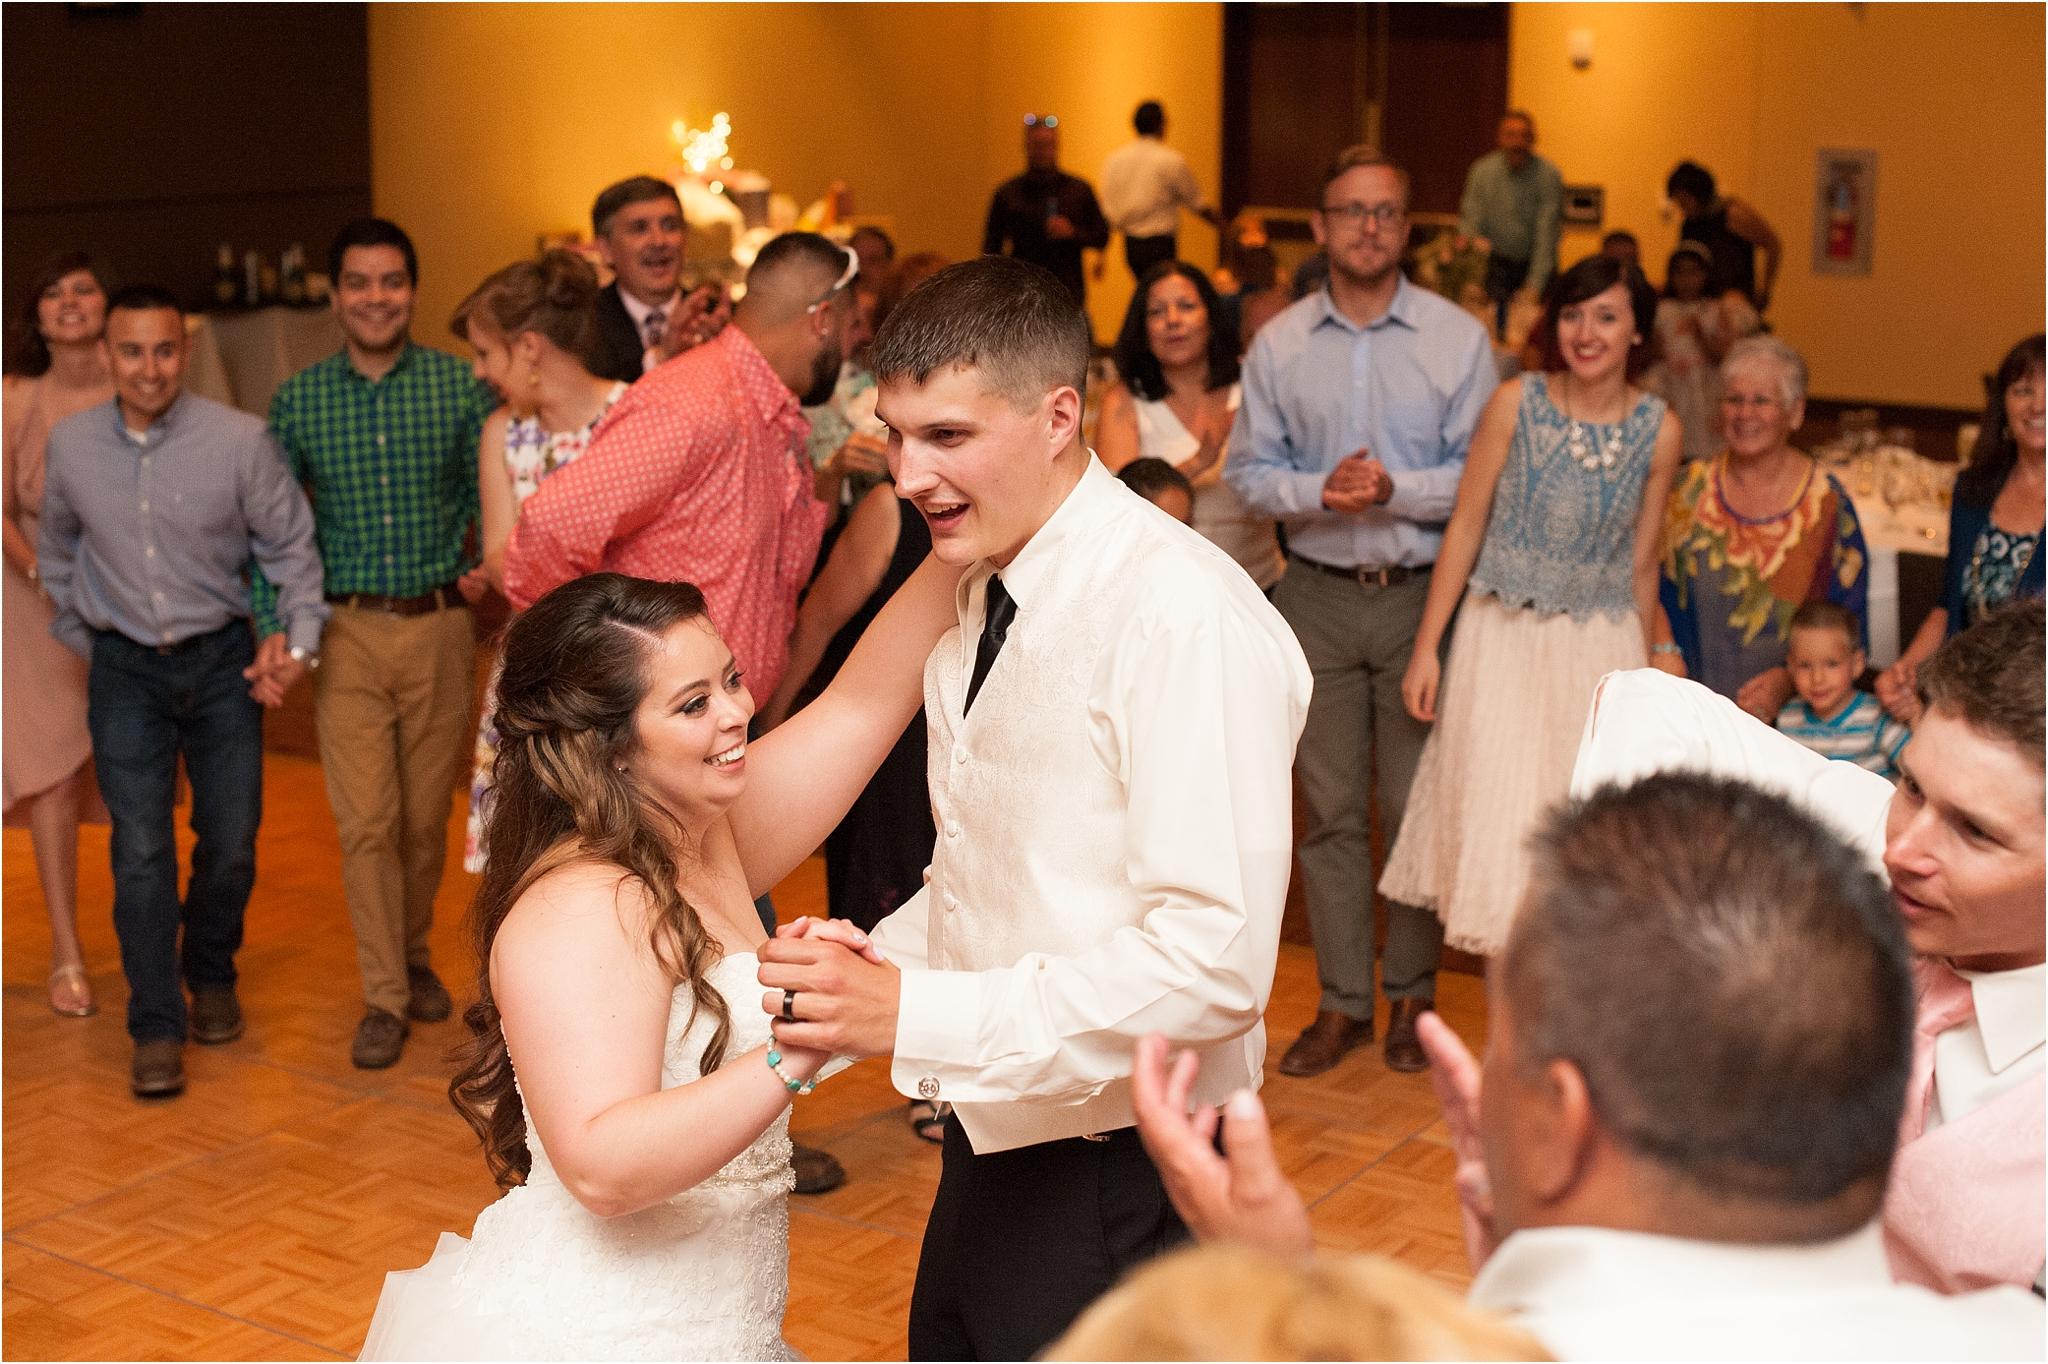 kayla kitts photography - isleta casino wedding - albuquerque wedding photographer - new mexico wedding photographer - de novo pastoral_0055.jpg